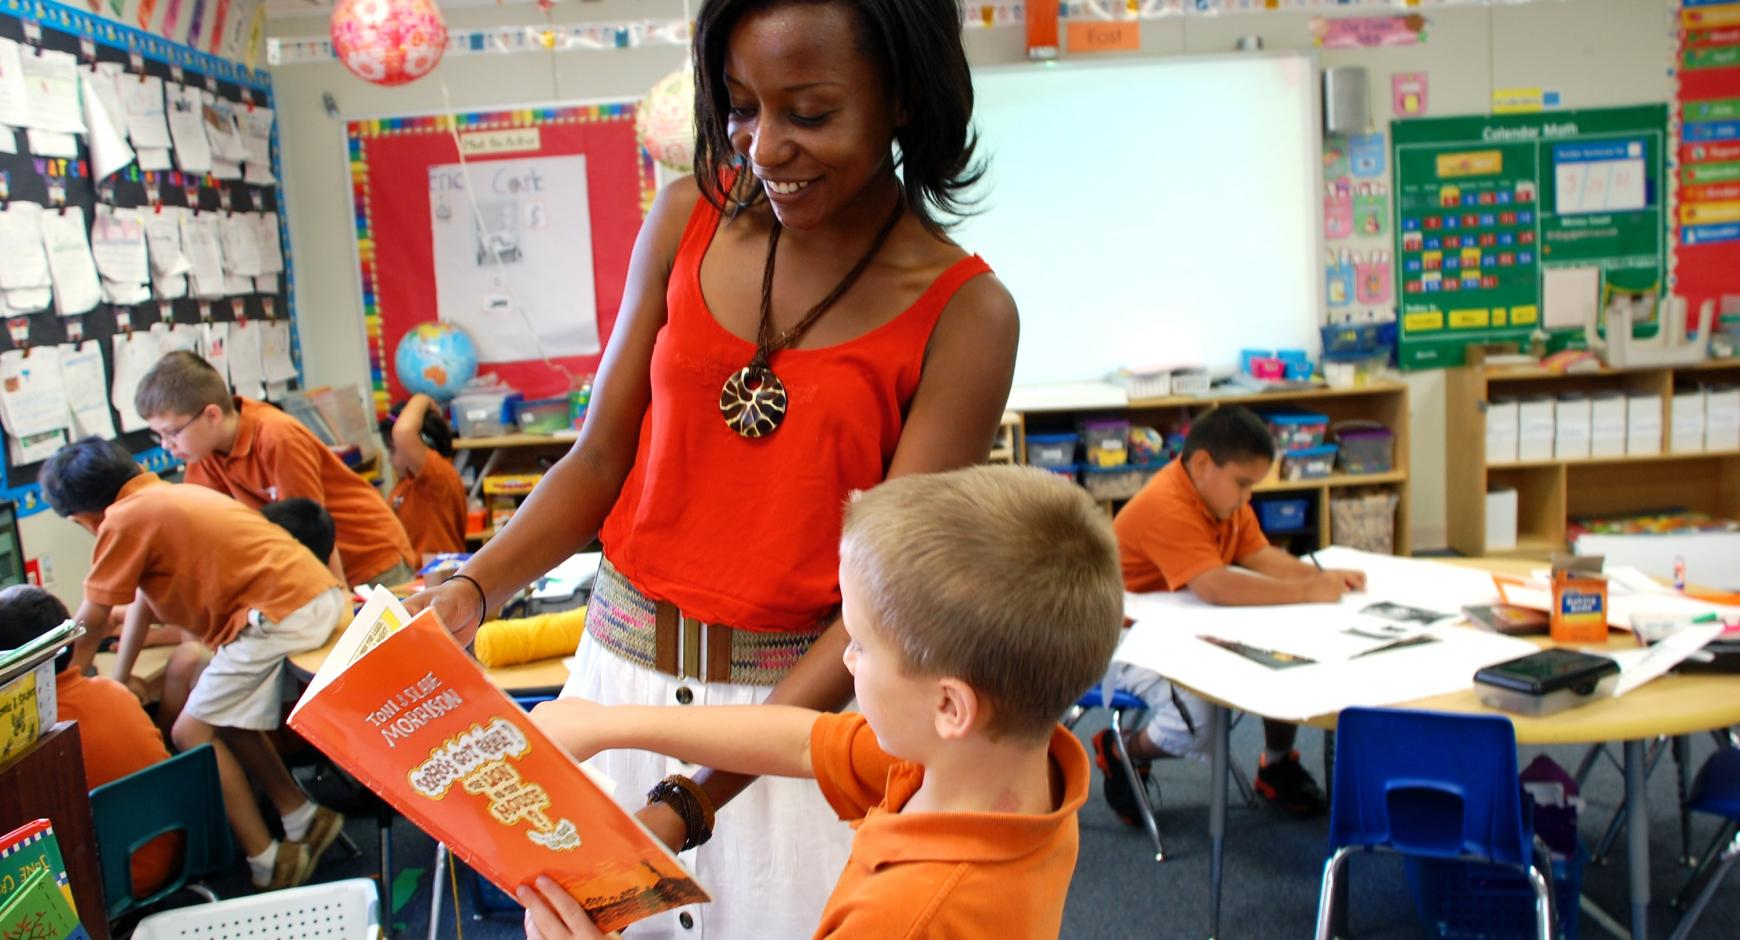 UT Elementary School teacher with student